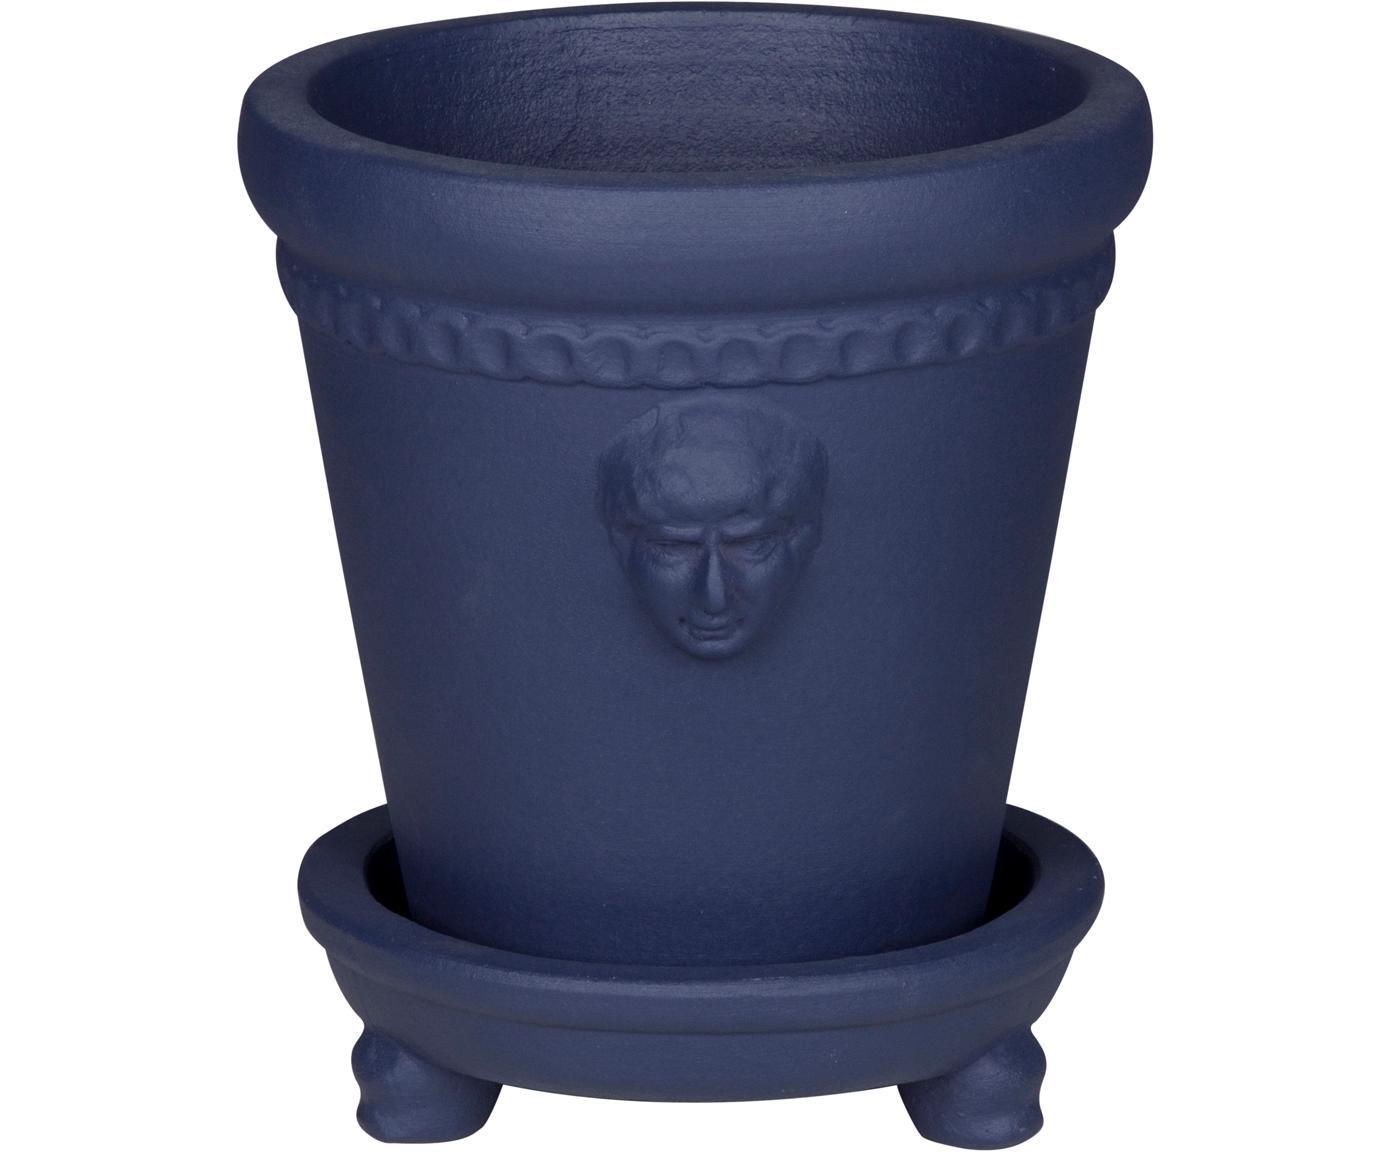 Plantenpot Ceasar van terracotta, Terracotta, Blauw, Ø 17 x H 20 cm